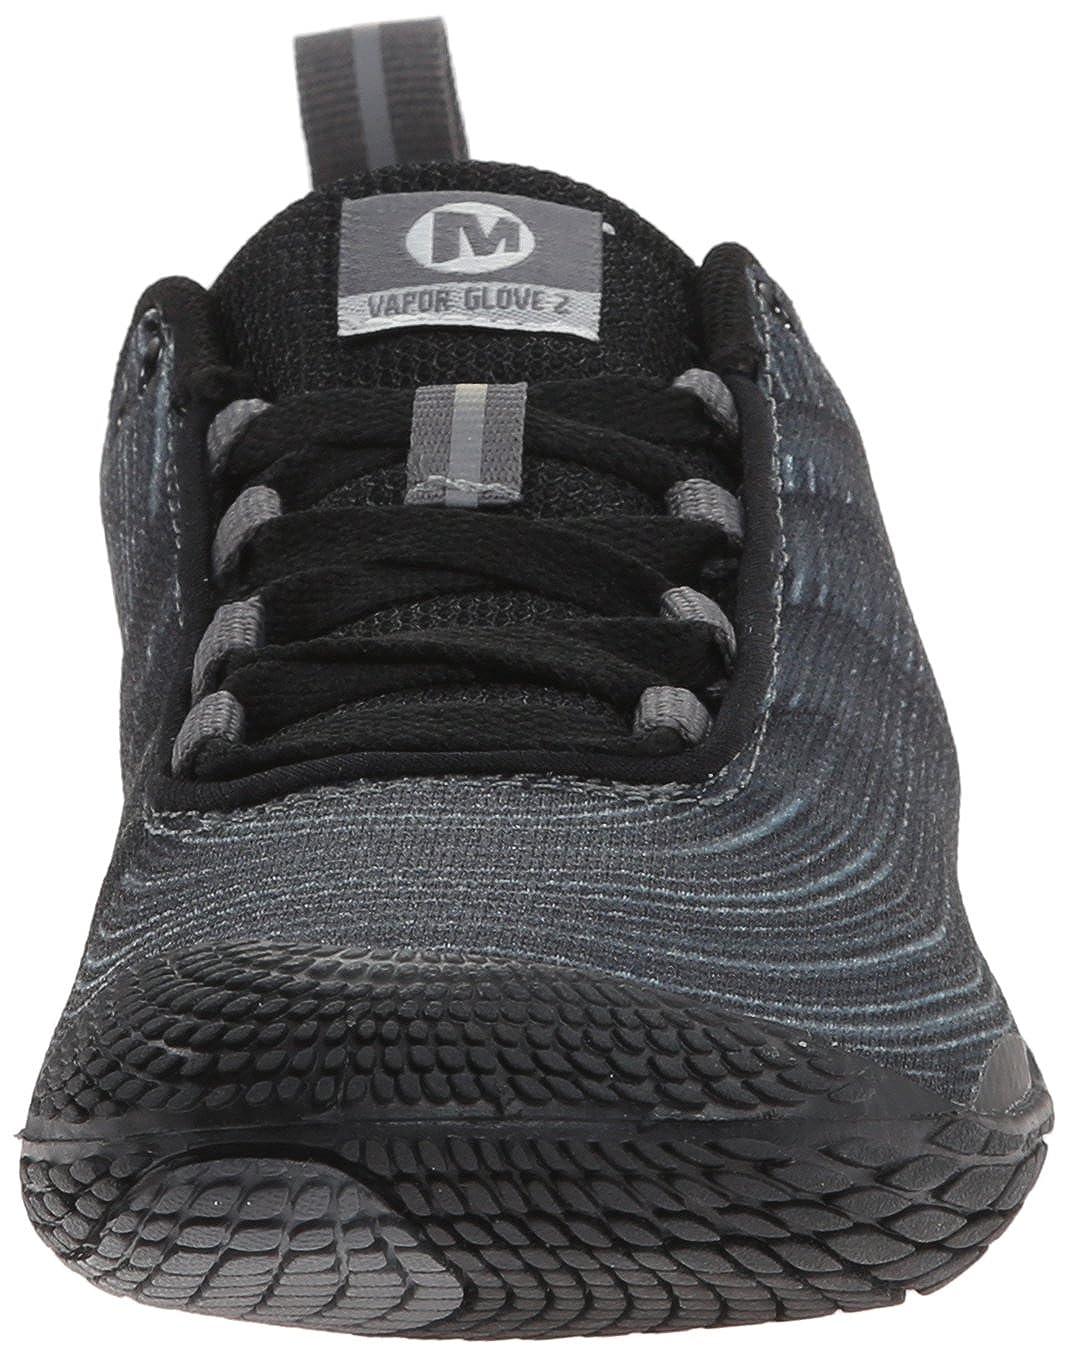 sale retailer 475db d93f3 Amazon.com   Merrell Women s Vapor Glove 2 Barefoot Trail Running Shoe    Trail Running